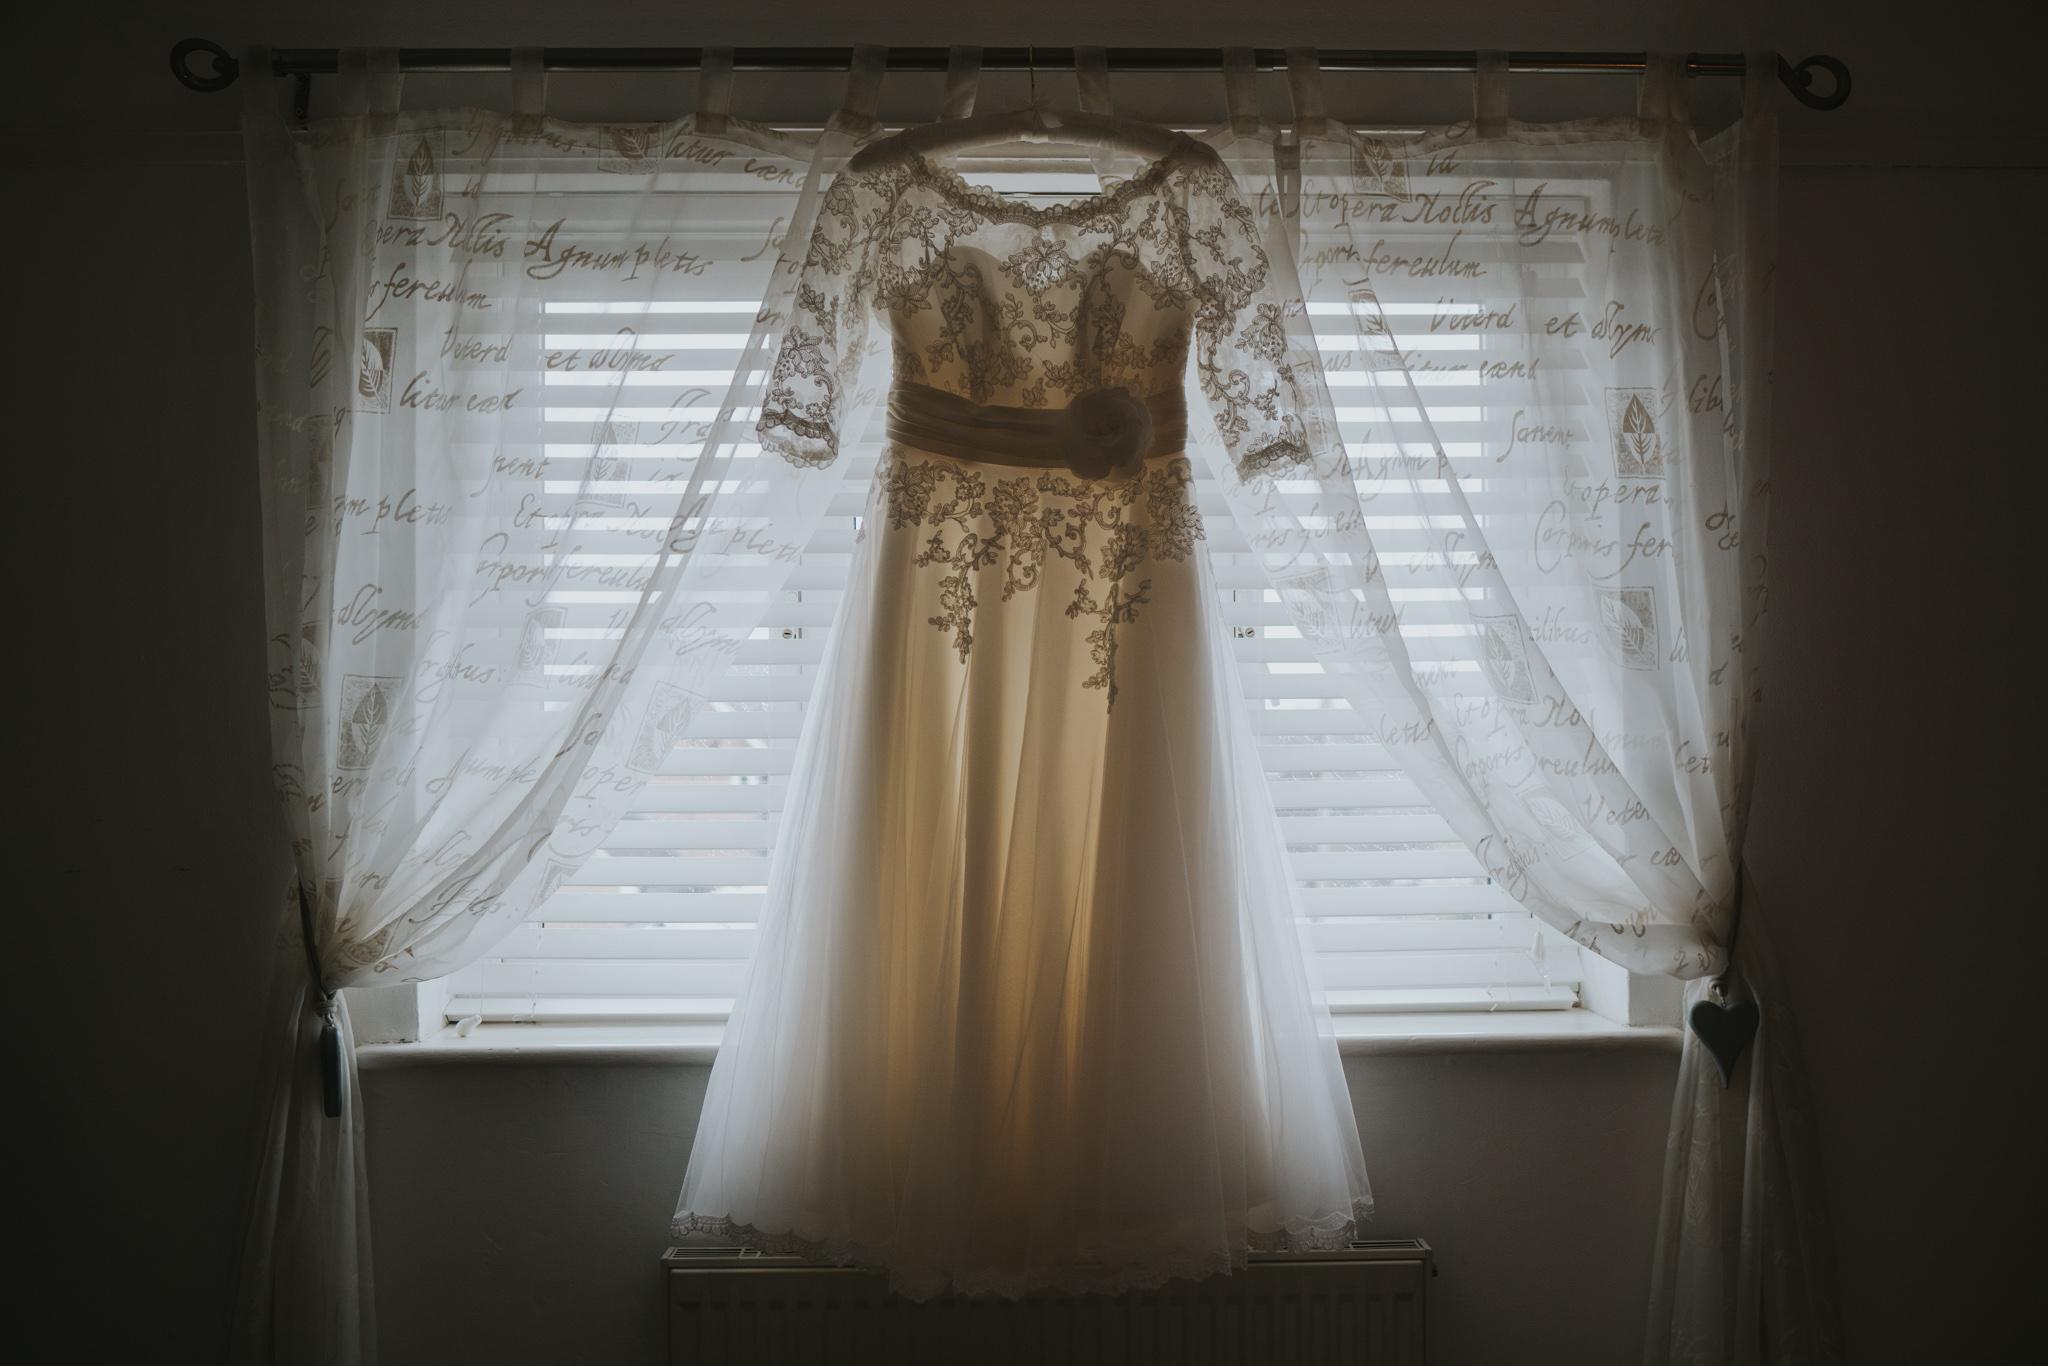 rhia-james-rustic-crabbs-barn-vintage-50s-retro-wedding-grace-elizabeth-colchester-essex-alternative-relaxed-wedding-family-photography-devon-suffolk-norfolk-essex (1 of 138).jpg